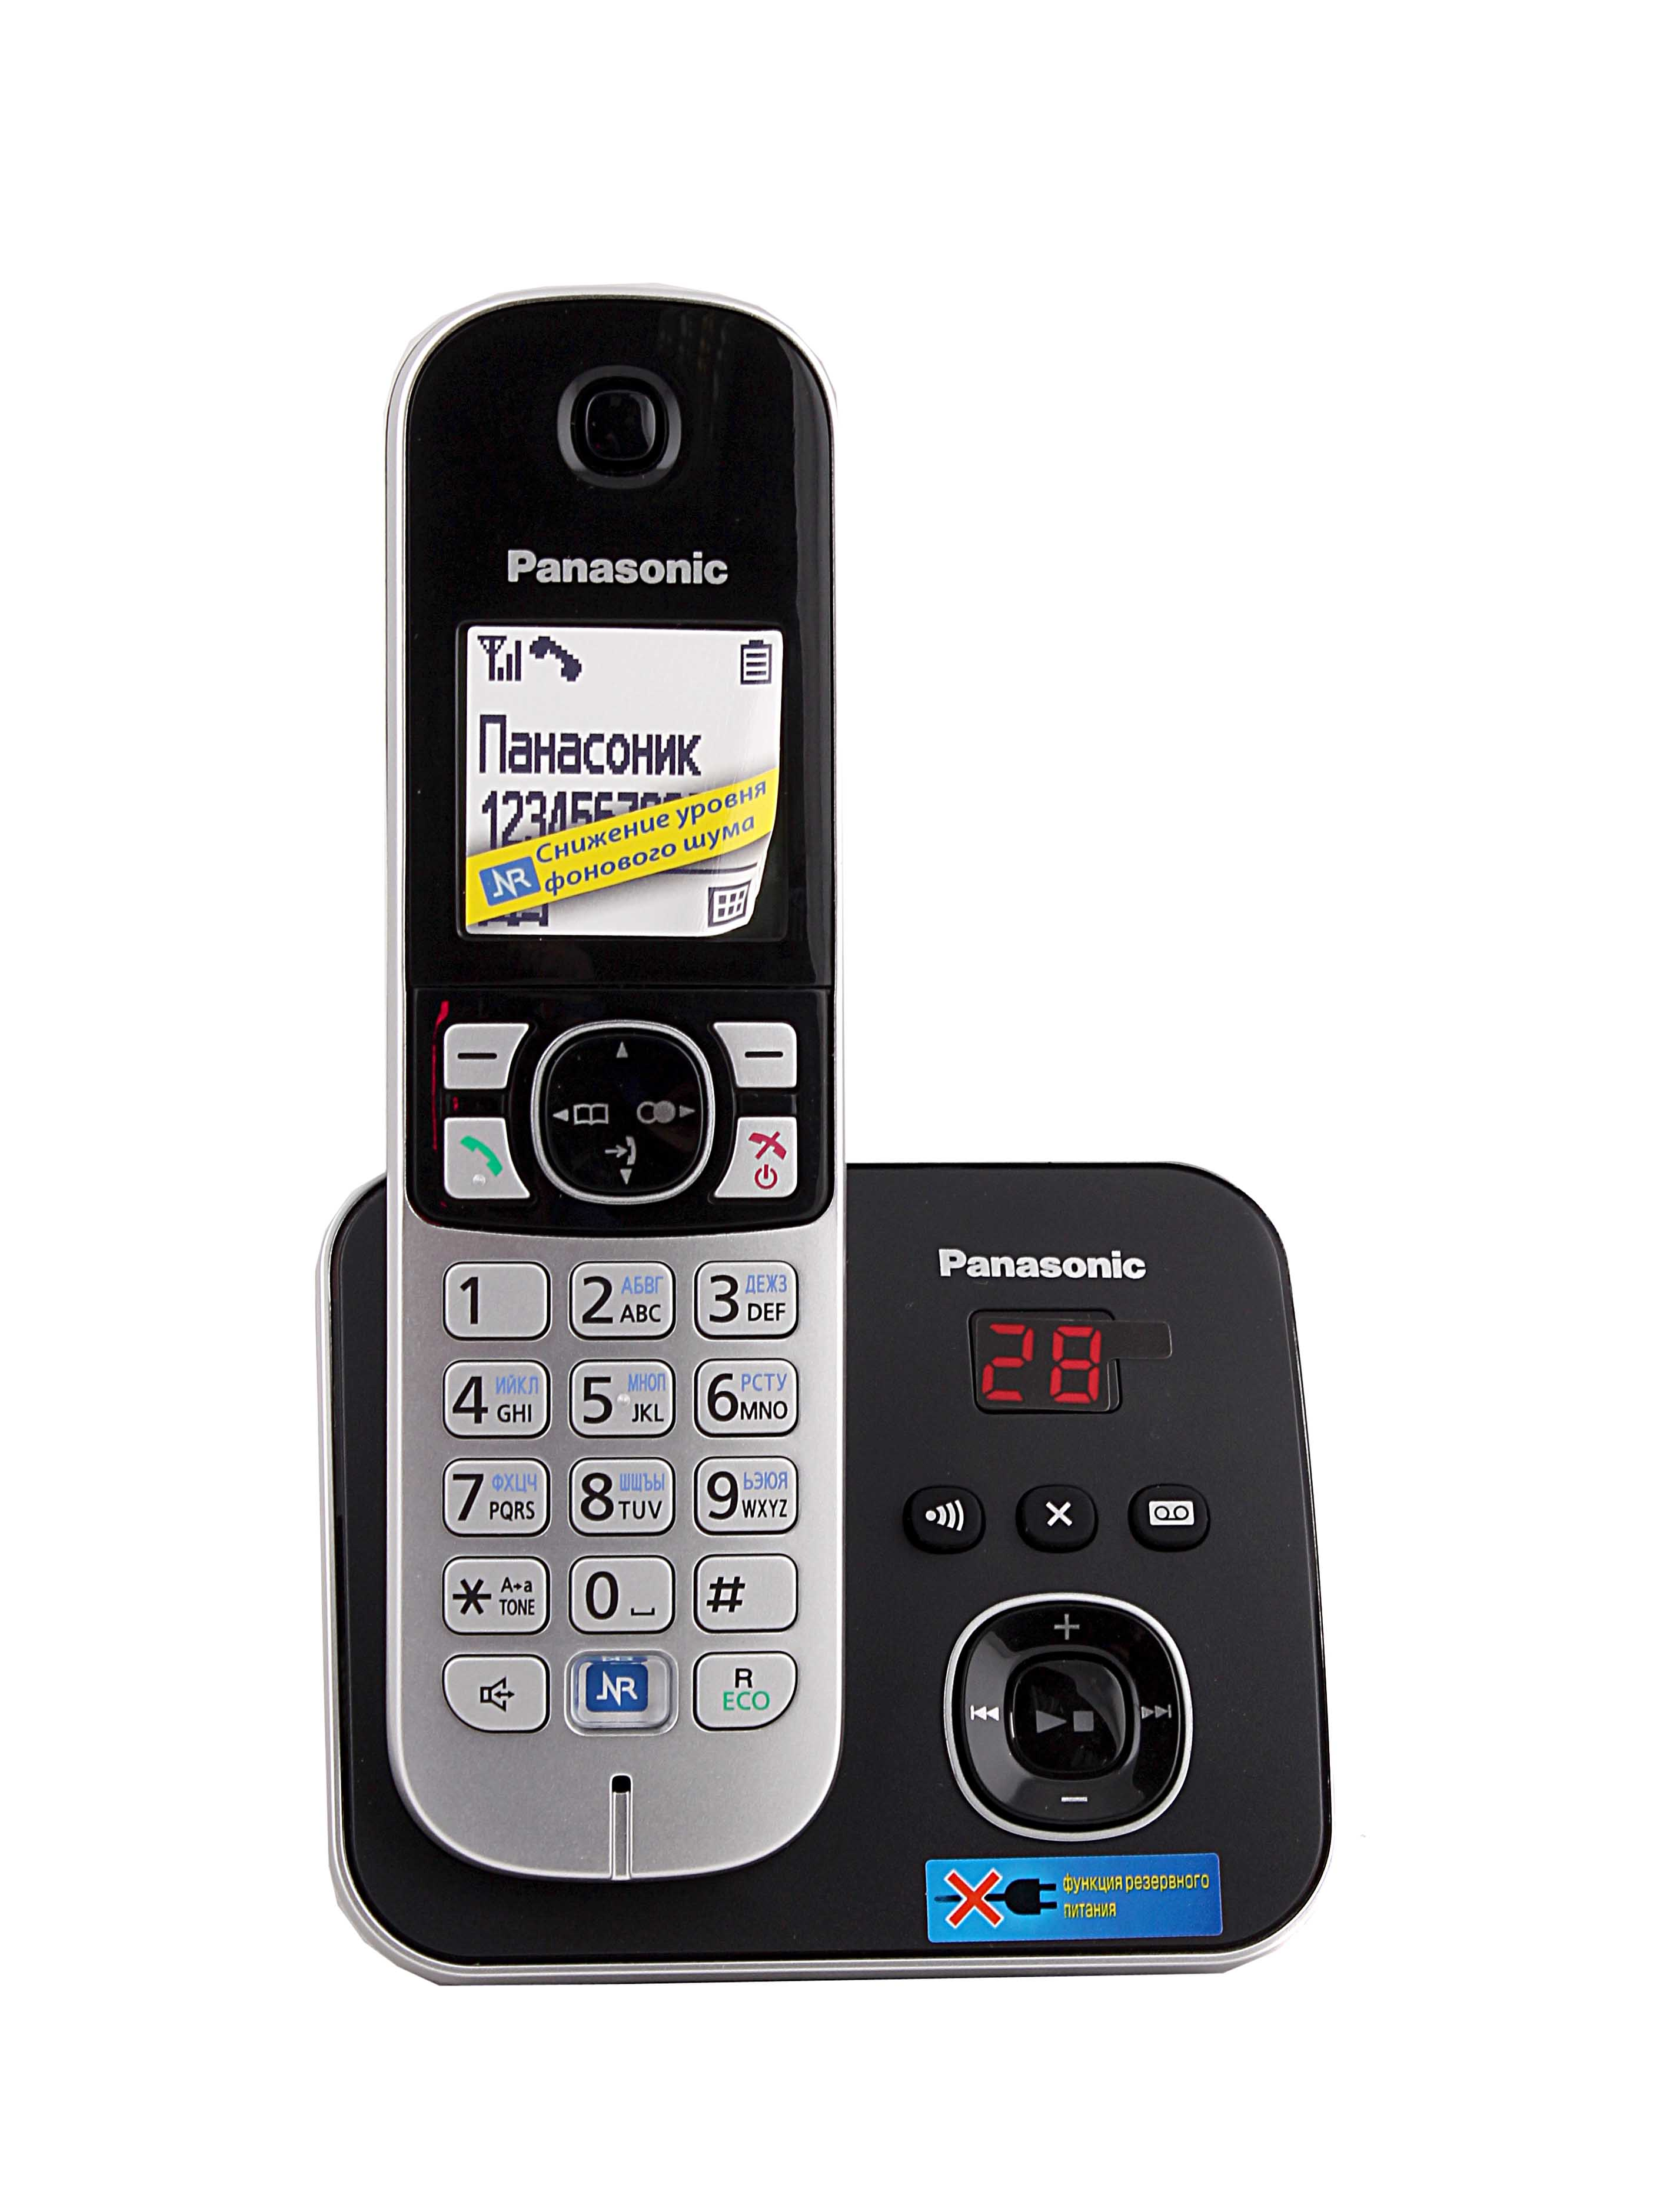 Радиотелефон Panasonic Real Brand Technics 1850.000